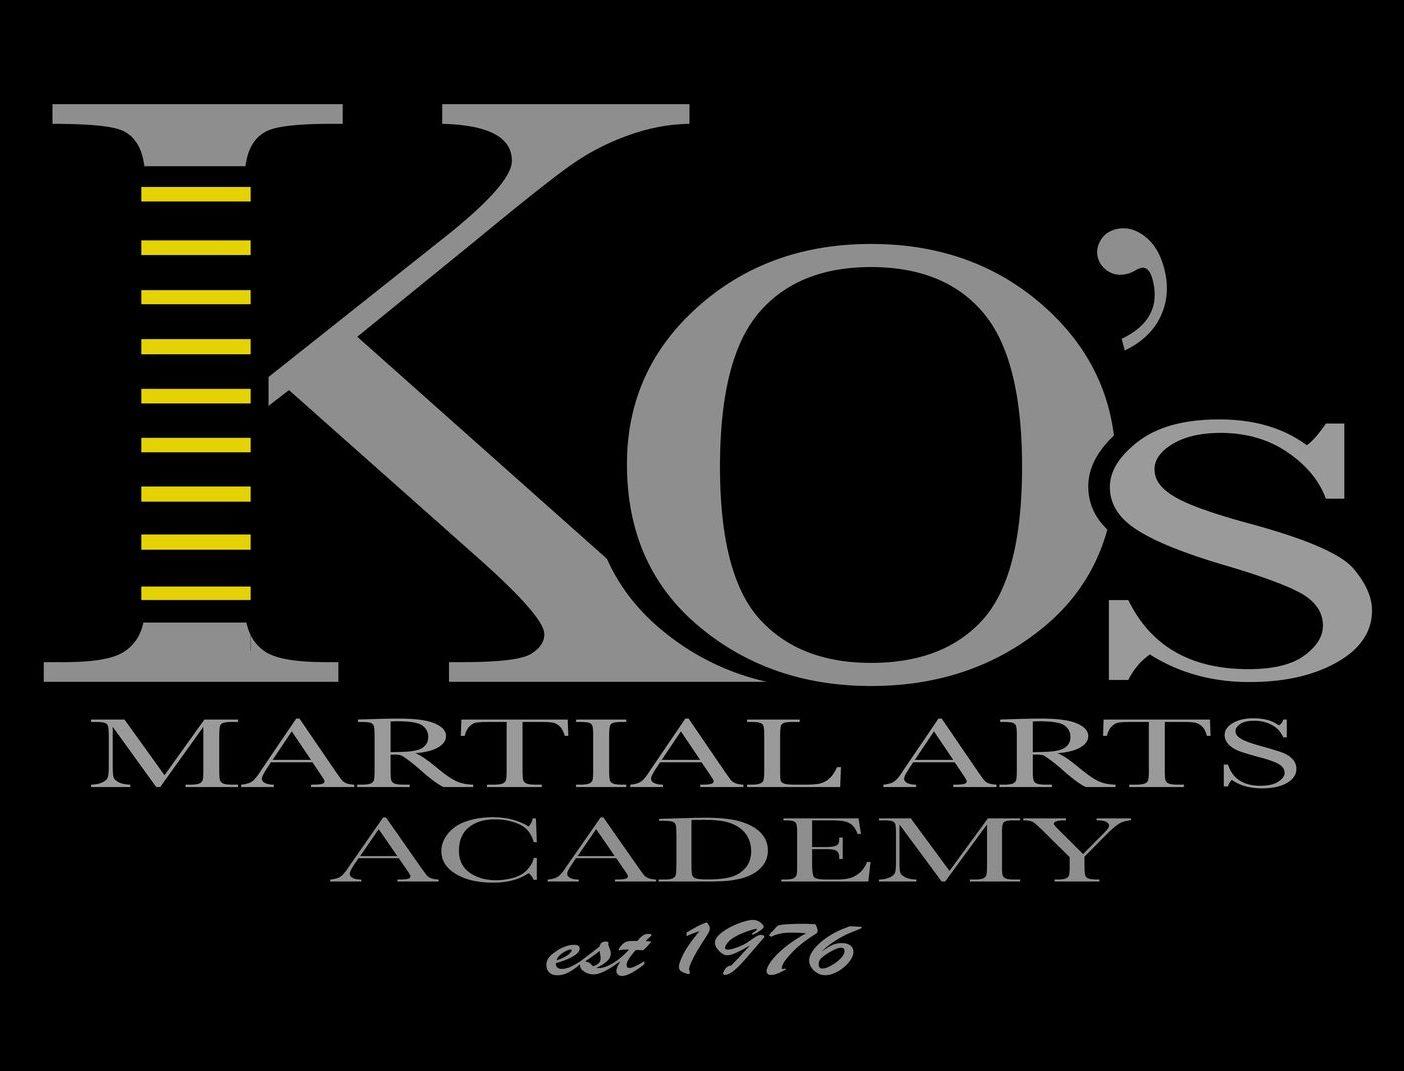 Ko's Martial Arts